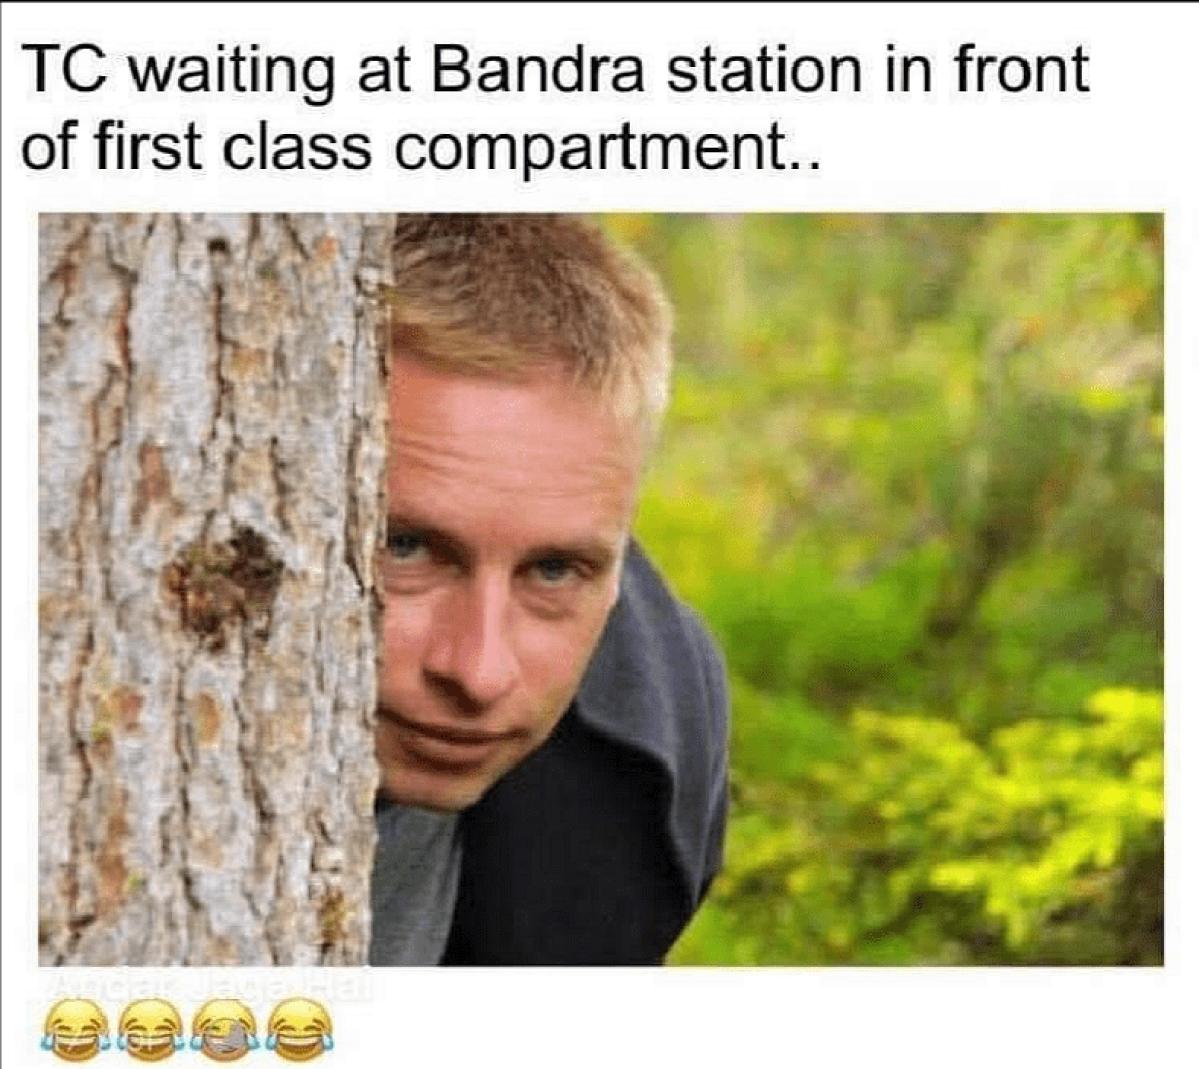 FPJ Fun Corner: Best WhatsApp jokes and memes to lighten your mood amid COVID-19 on January 9, 2021